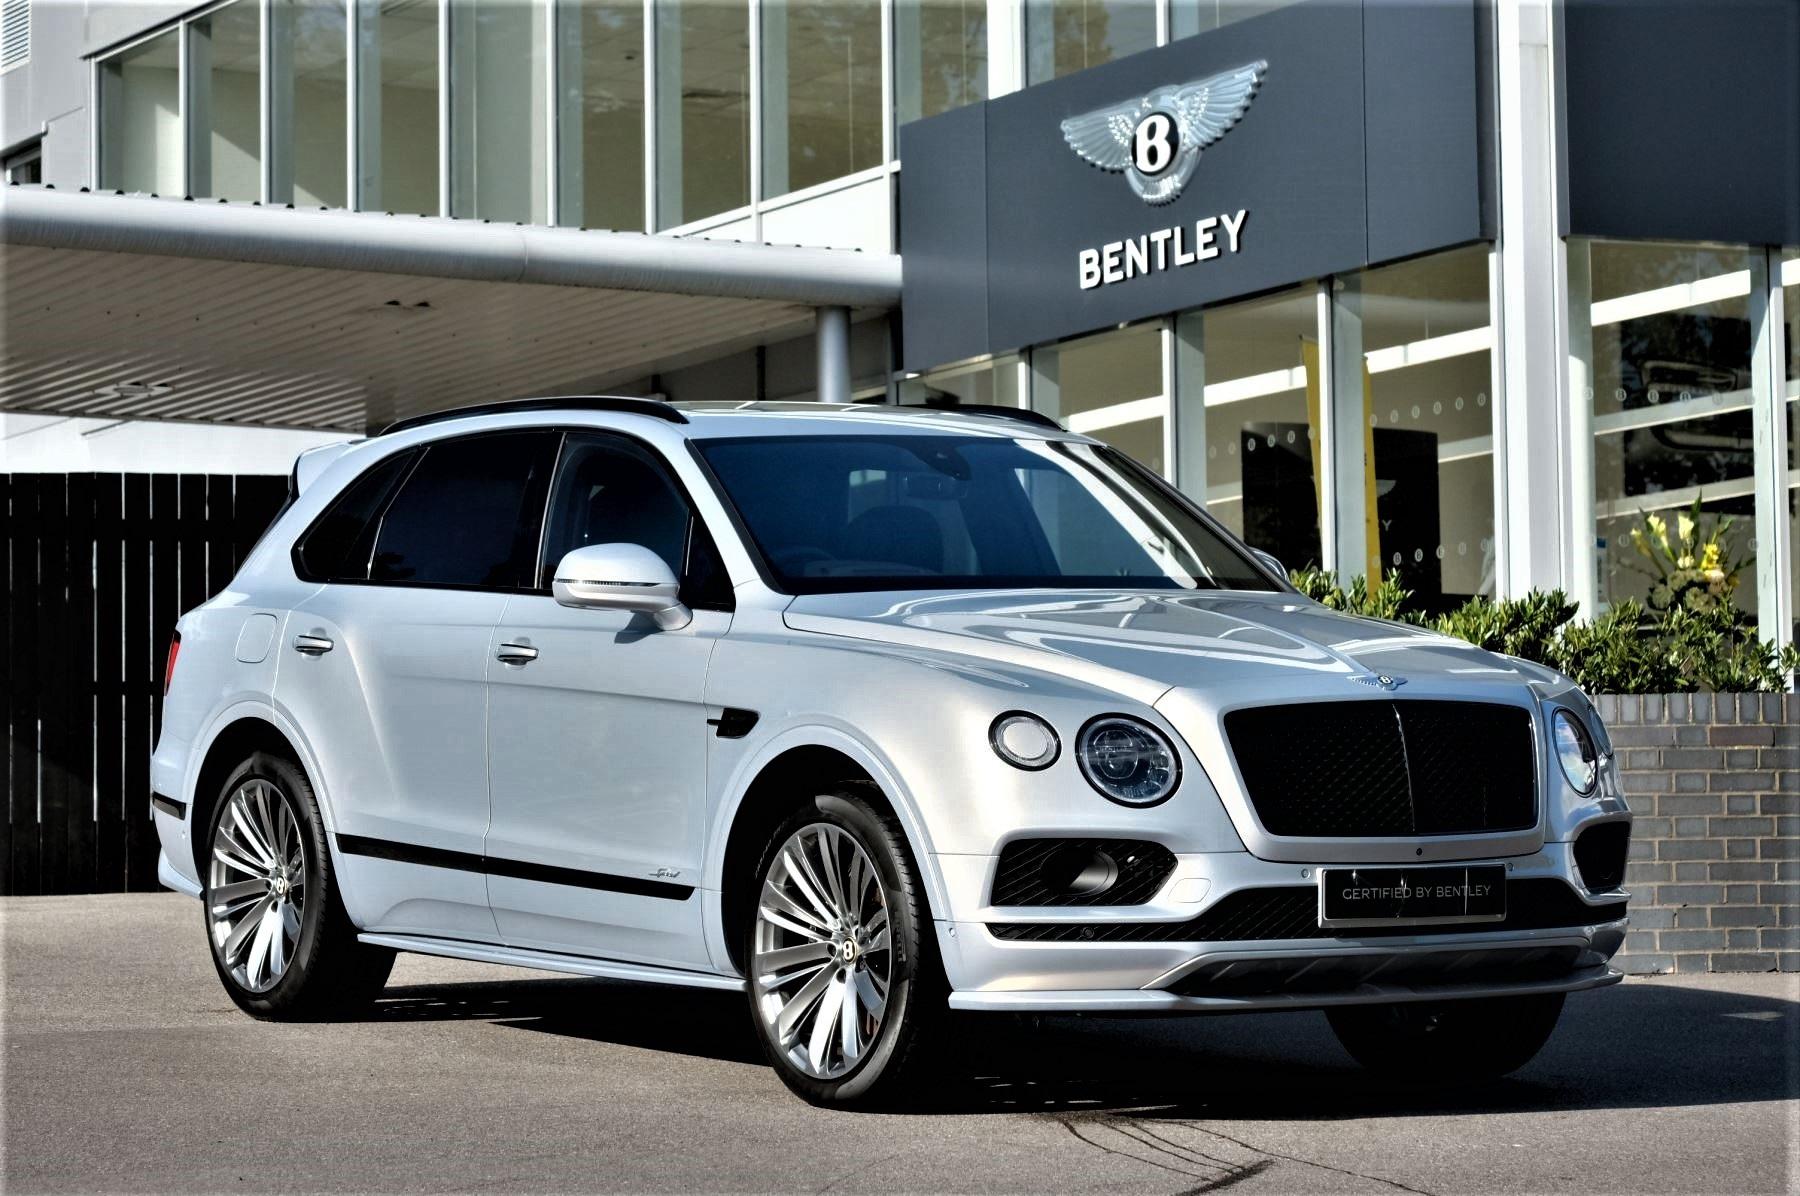 Bentley Bentayga Speed - City & Touring image 1